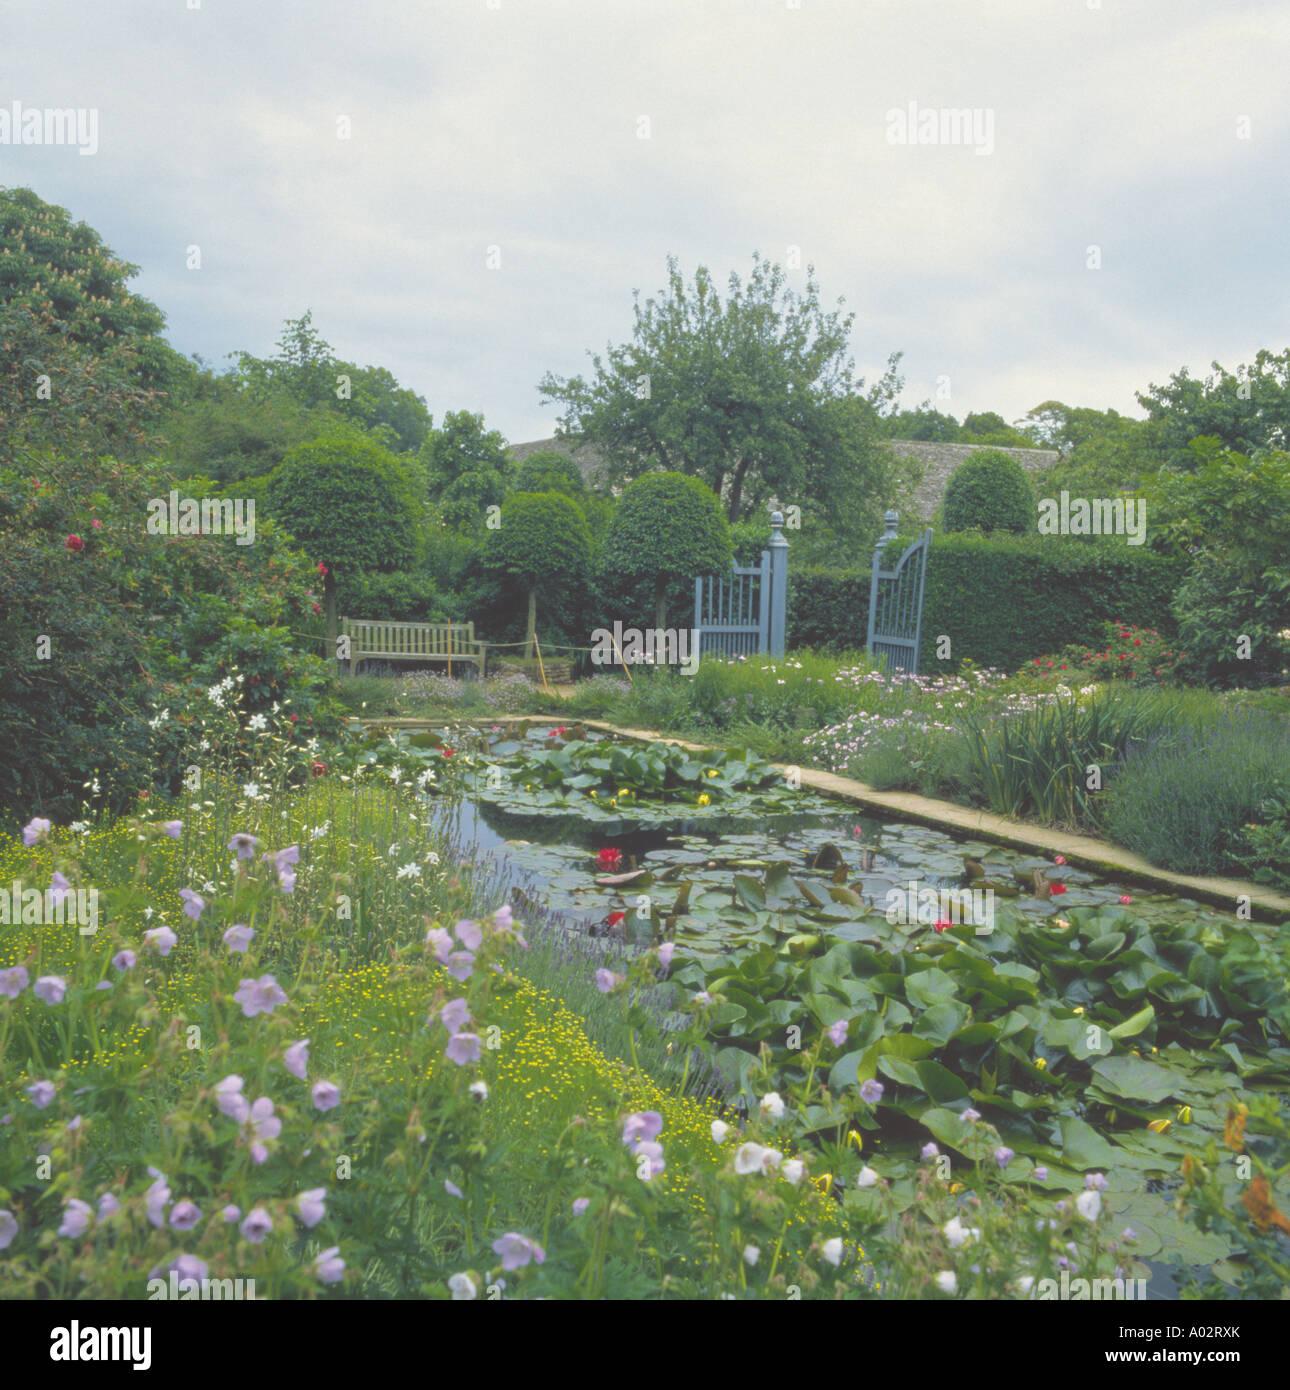 Merveilleux Large Rectangular Garden Pond With Waterlilies Beside ...